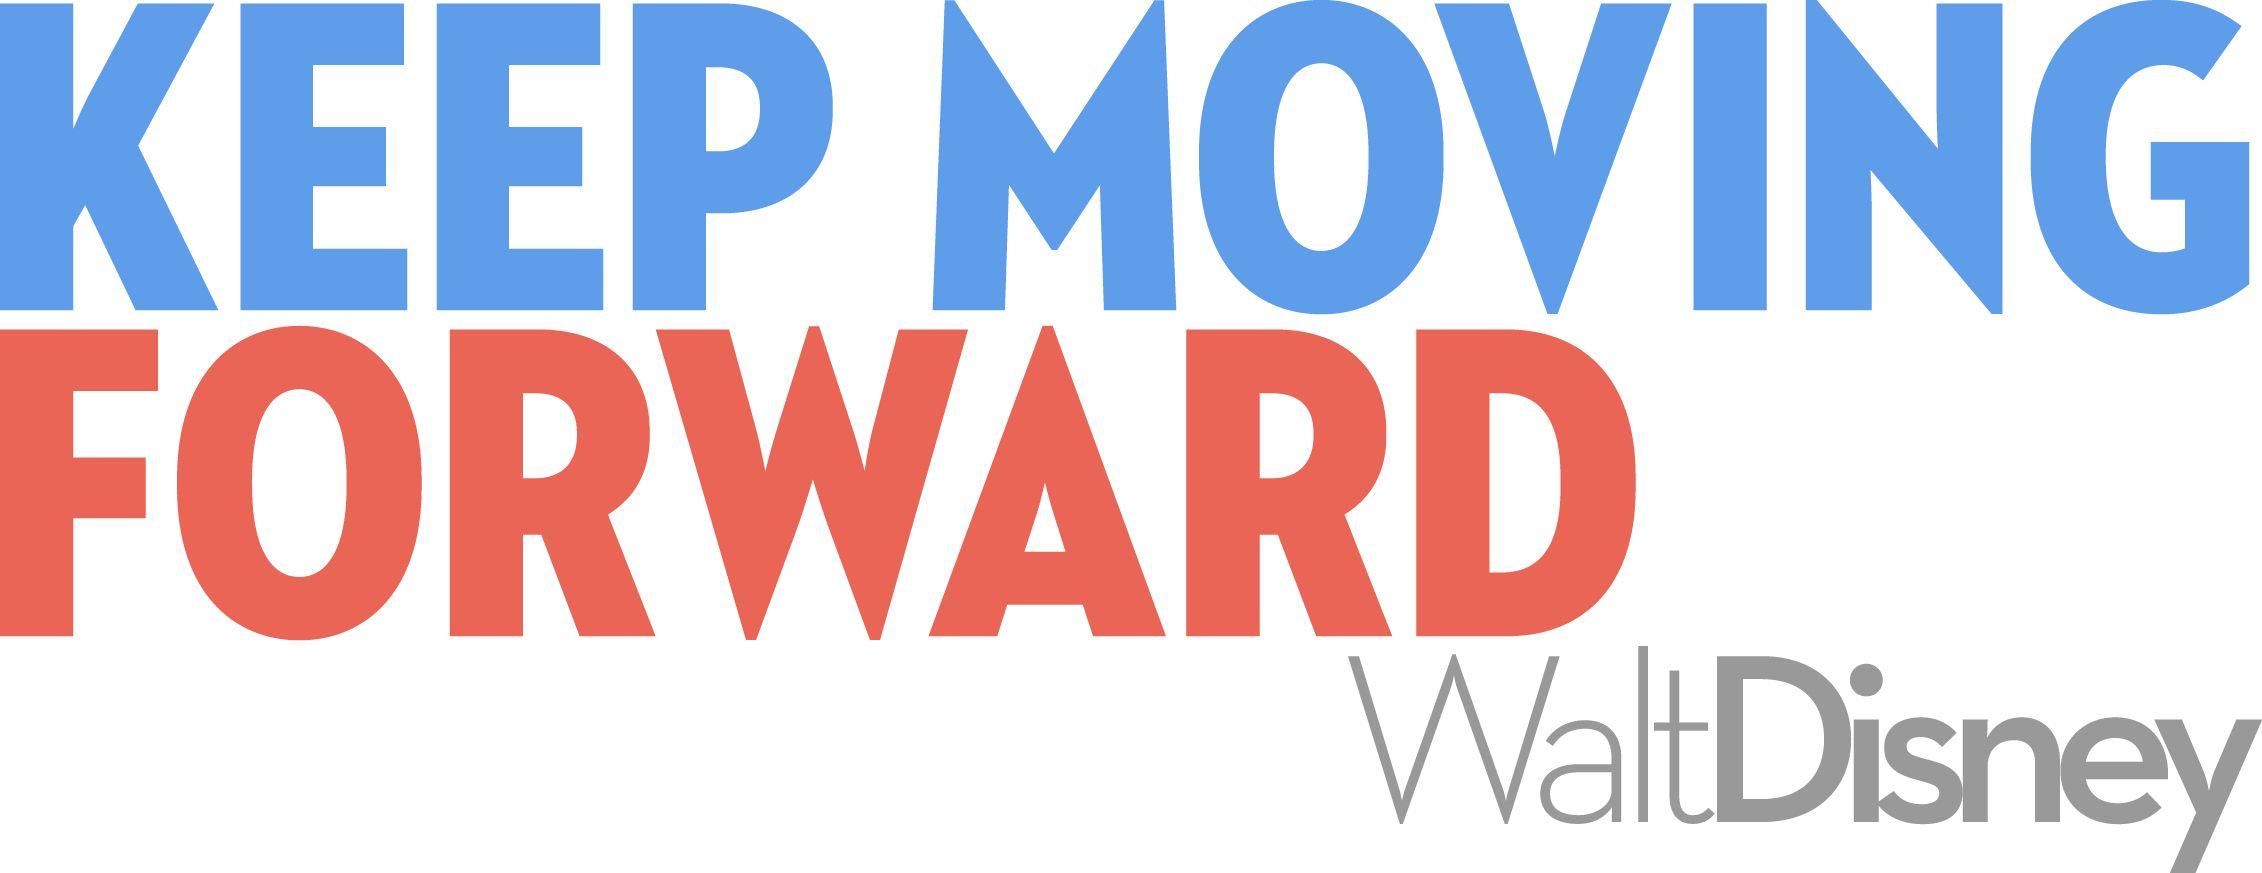 Keep Moving Forward Quote Keepmovingforwardquotedisneywaltdisneyquotesmeetthe